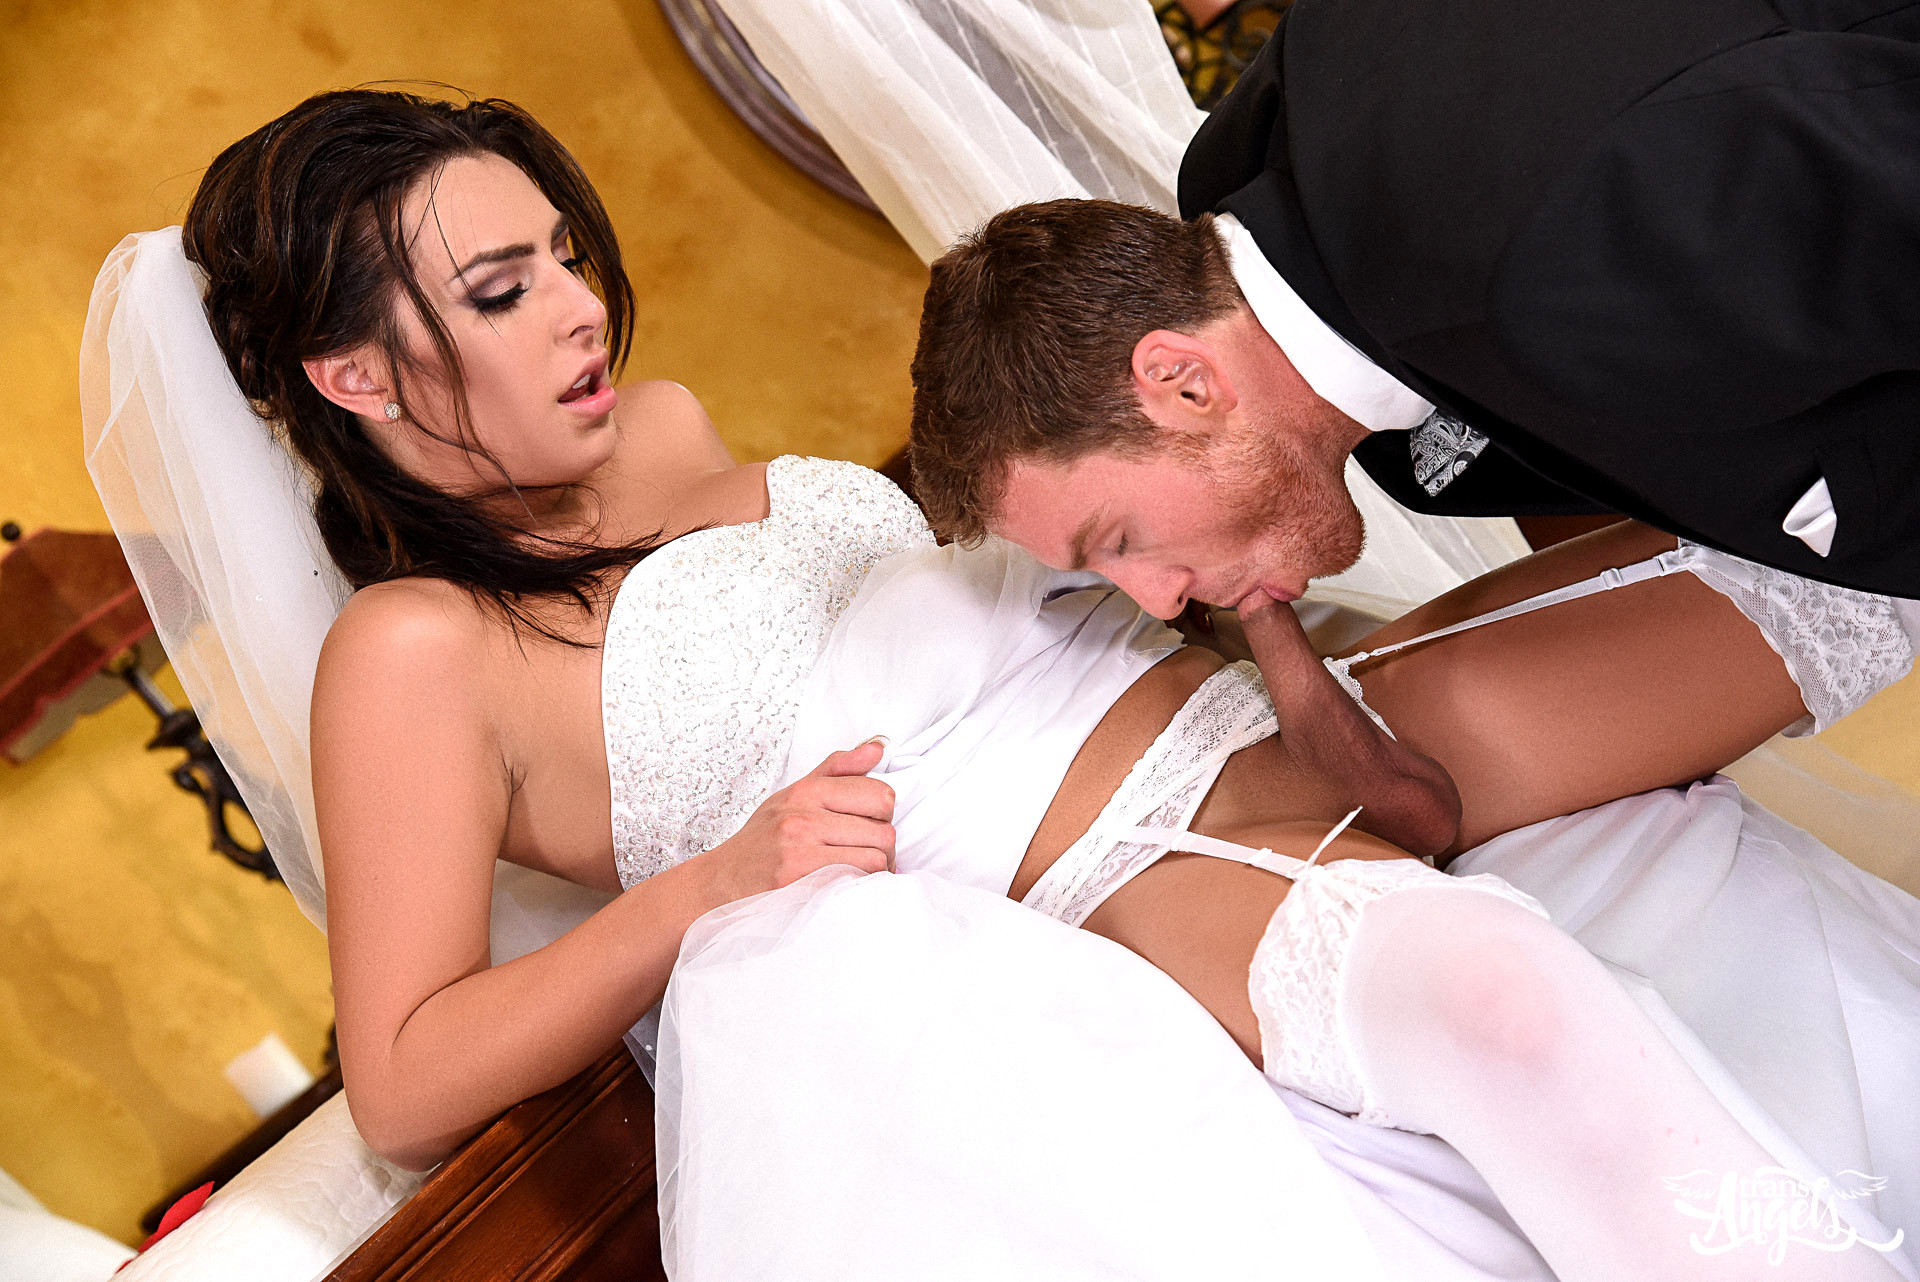 First Night Xxx Wedding Hot Porn Pics And Gif Blog